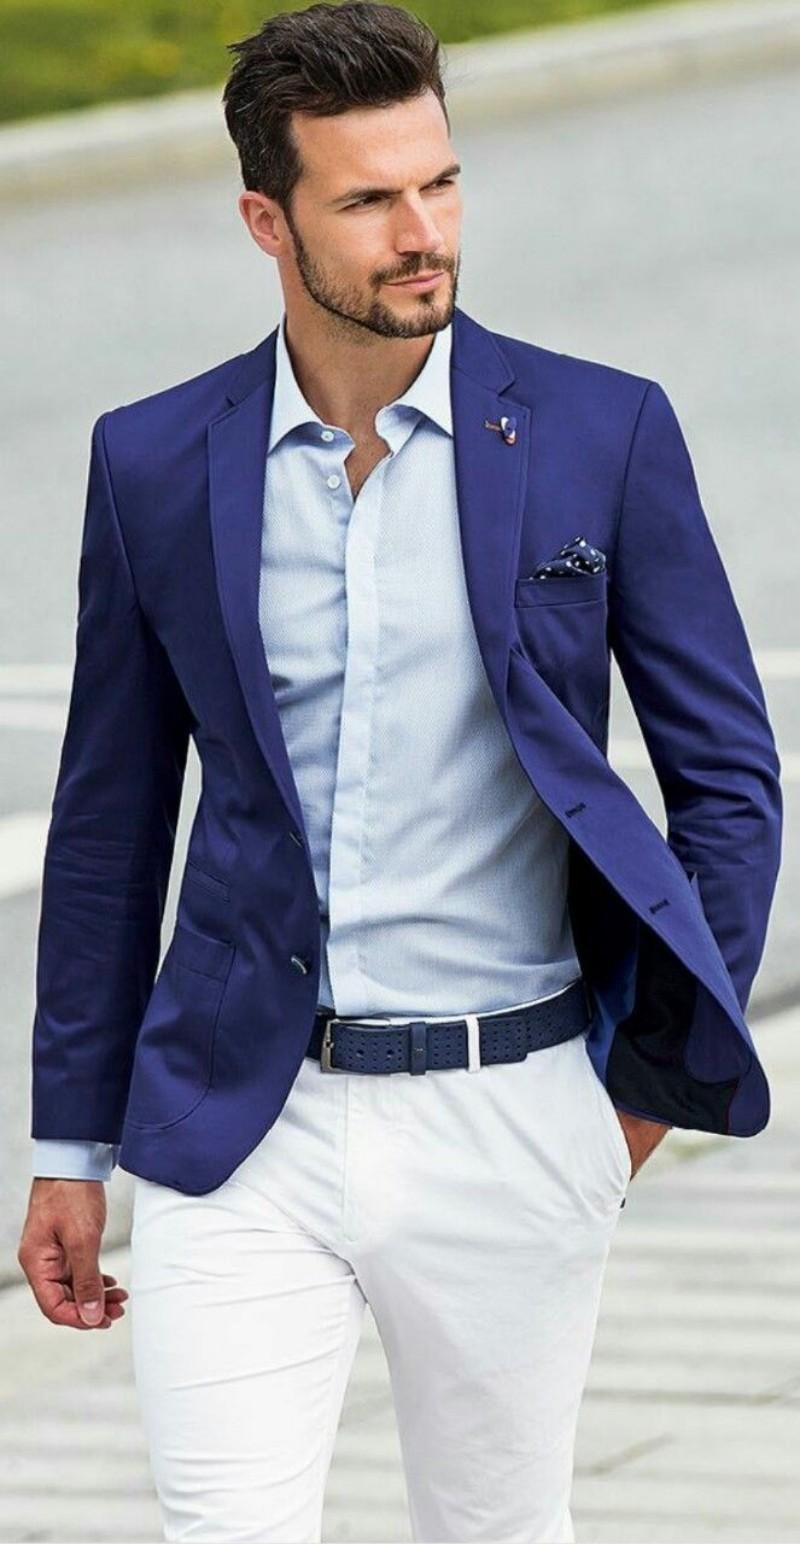 Beach Groom Tuxedos Suit Fit Two Button Slim Spring Party Best Man Evening Casual Men Suits Groomsman/Men Suits Jacket+Pants+Tie C1657